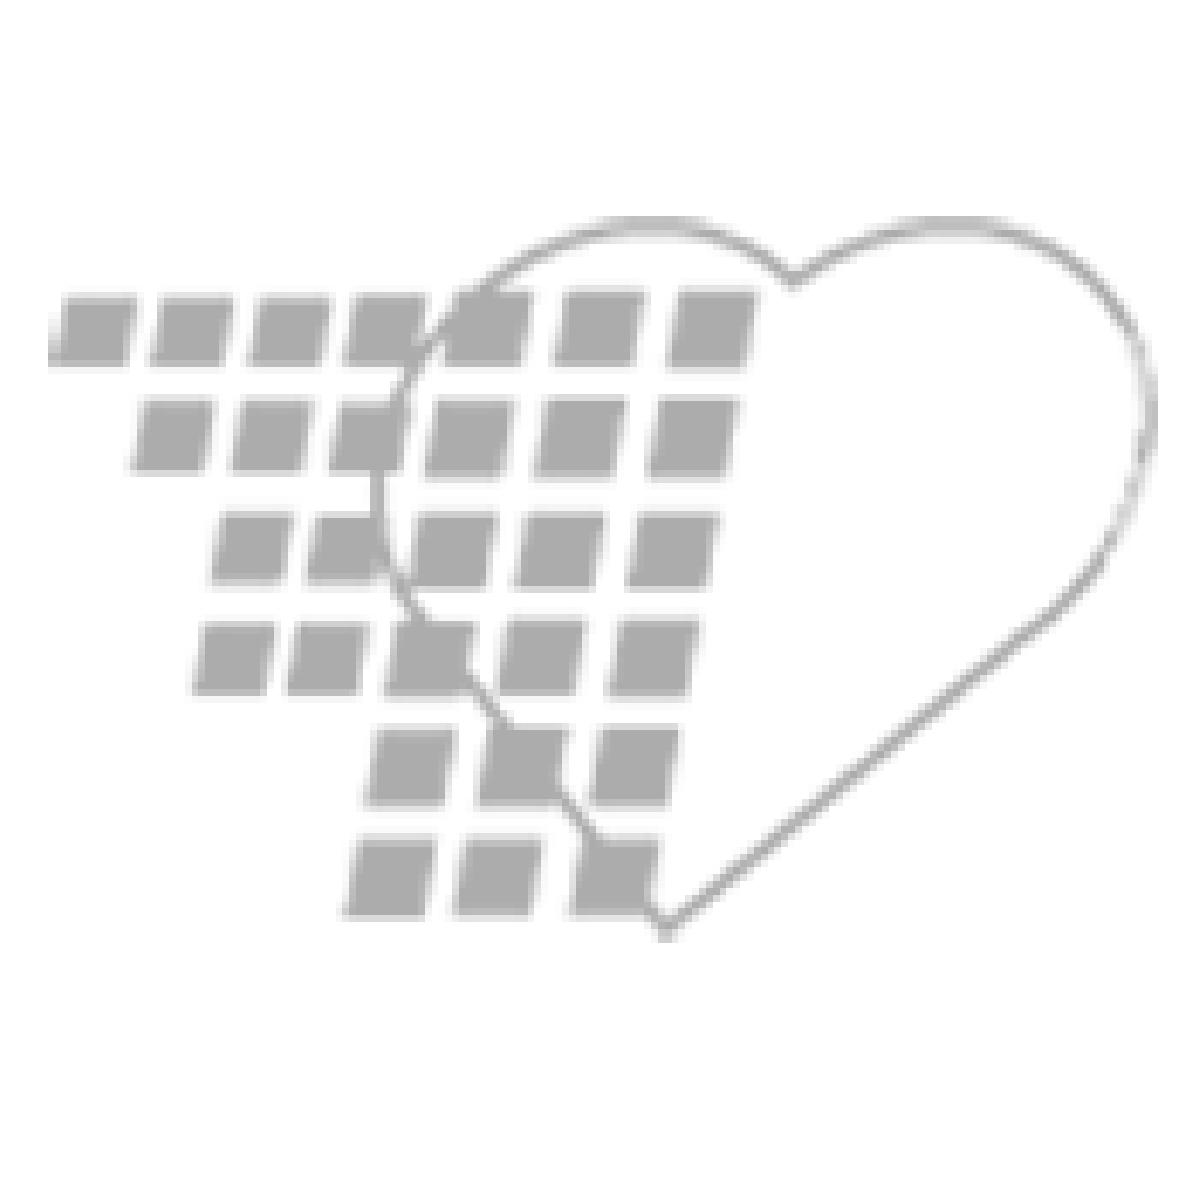 11-81-8002 Simulaids Smart STAT Basic